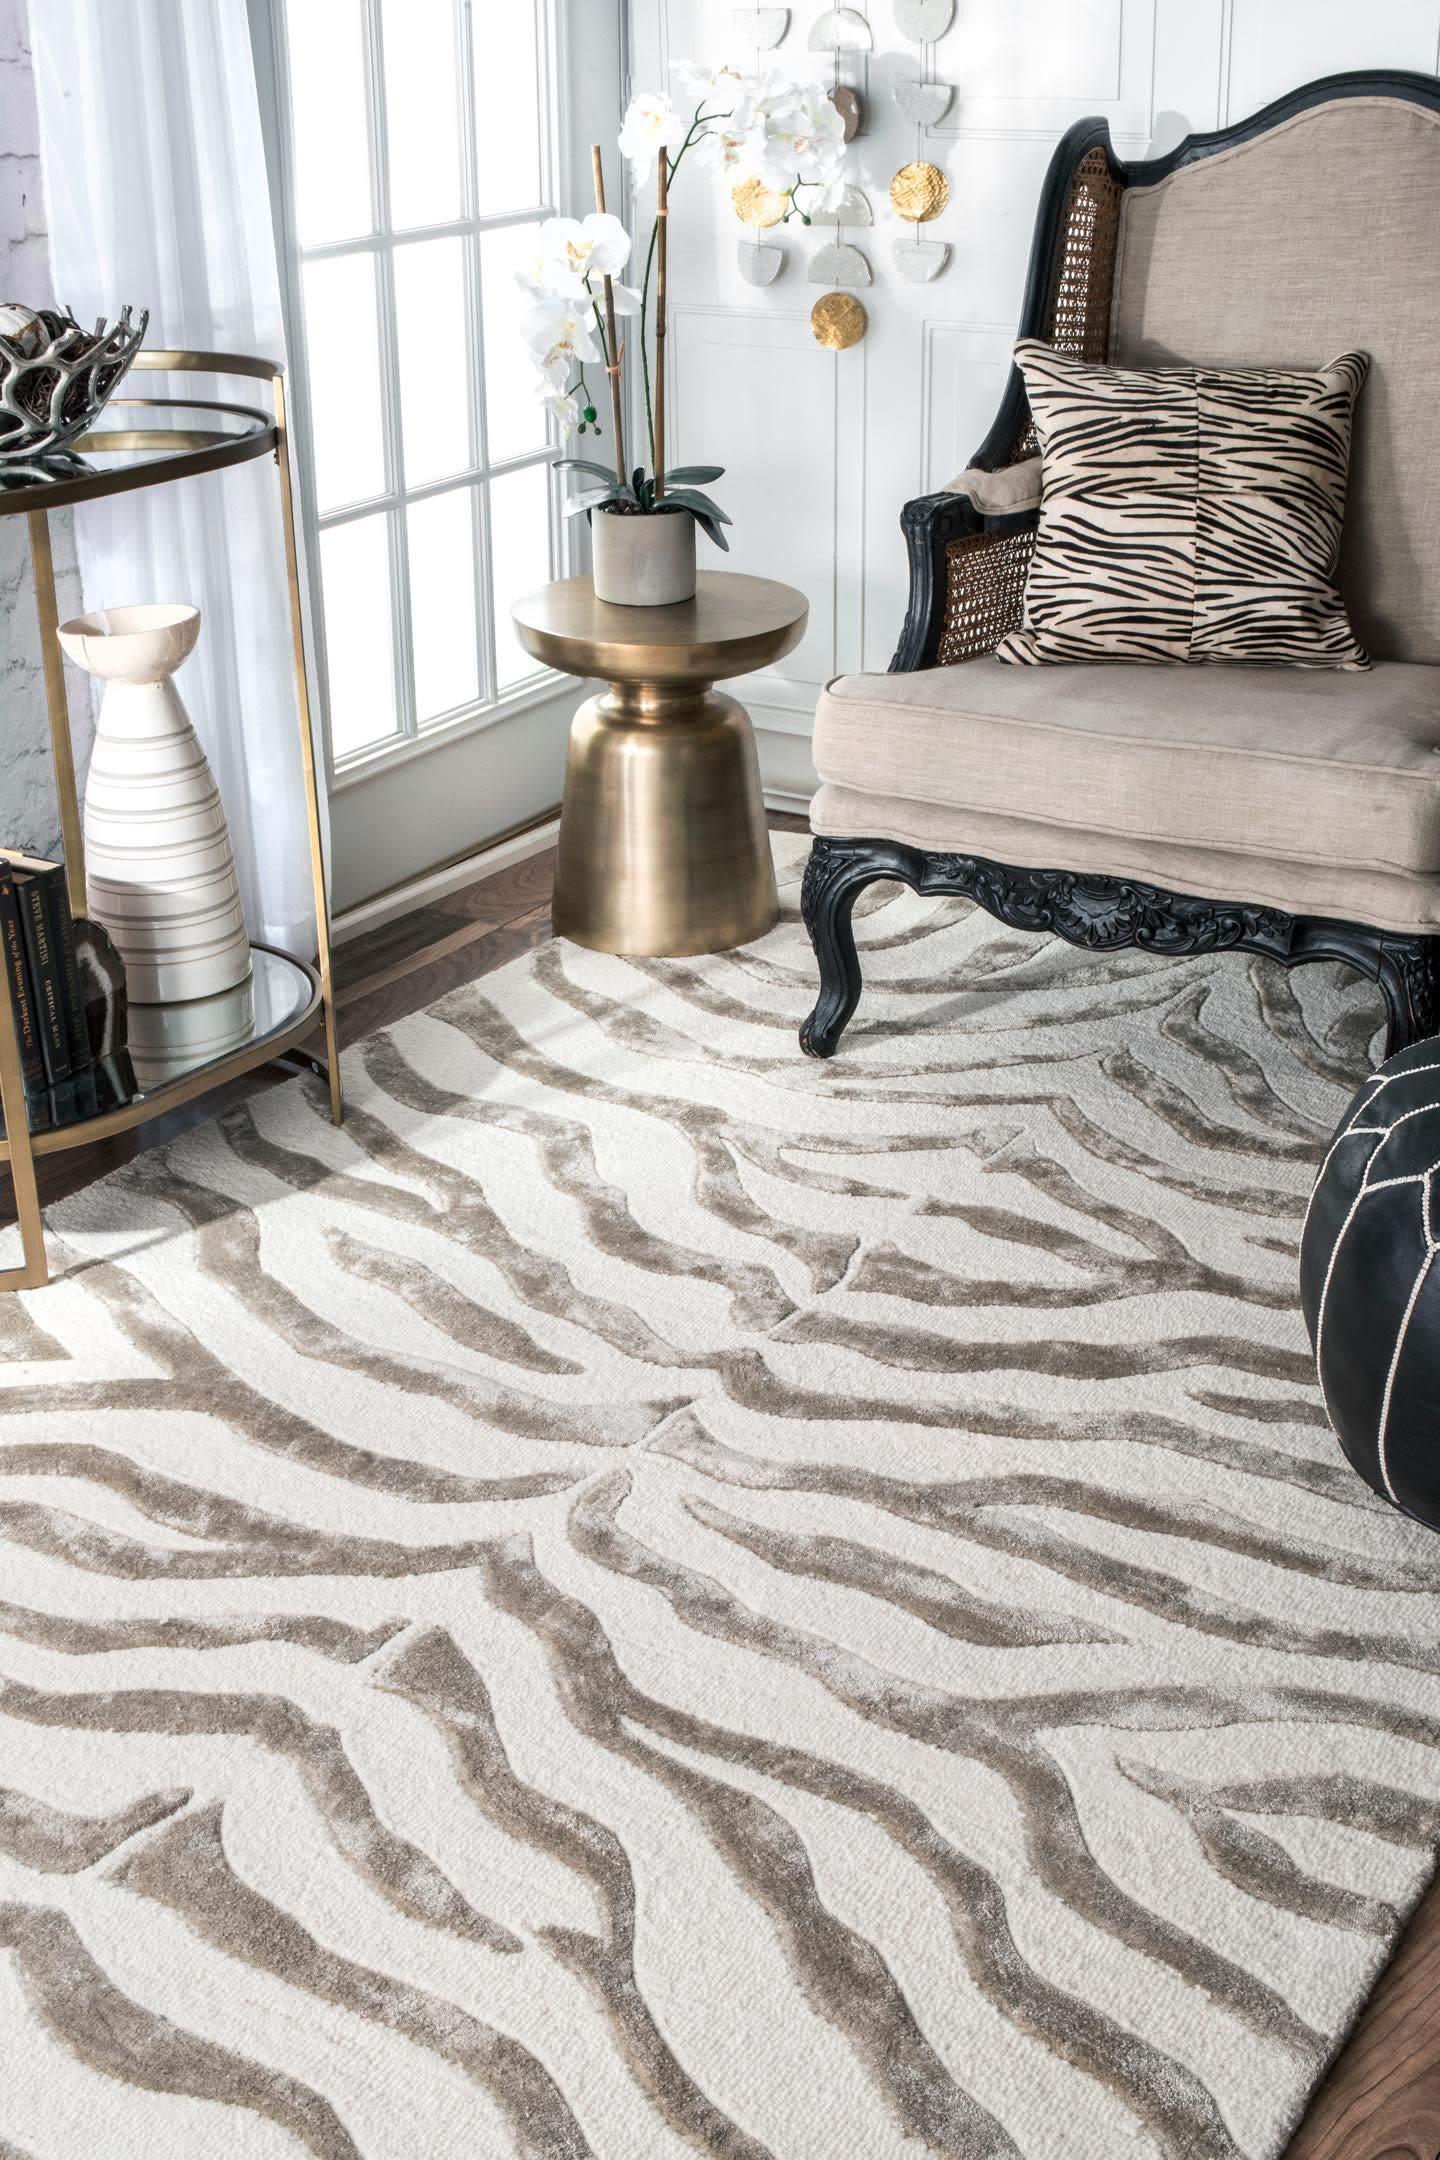 nuLOOM Zebra Hand Tufted Plush Wool Area Rug, 4' x 6', Grey